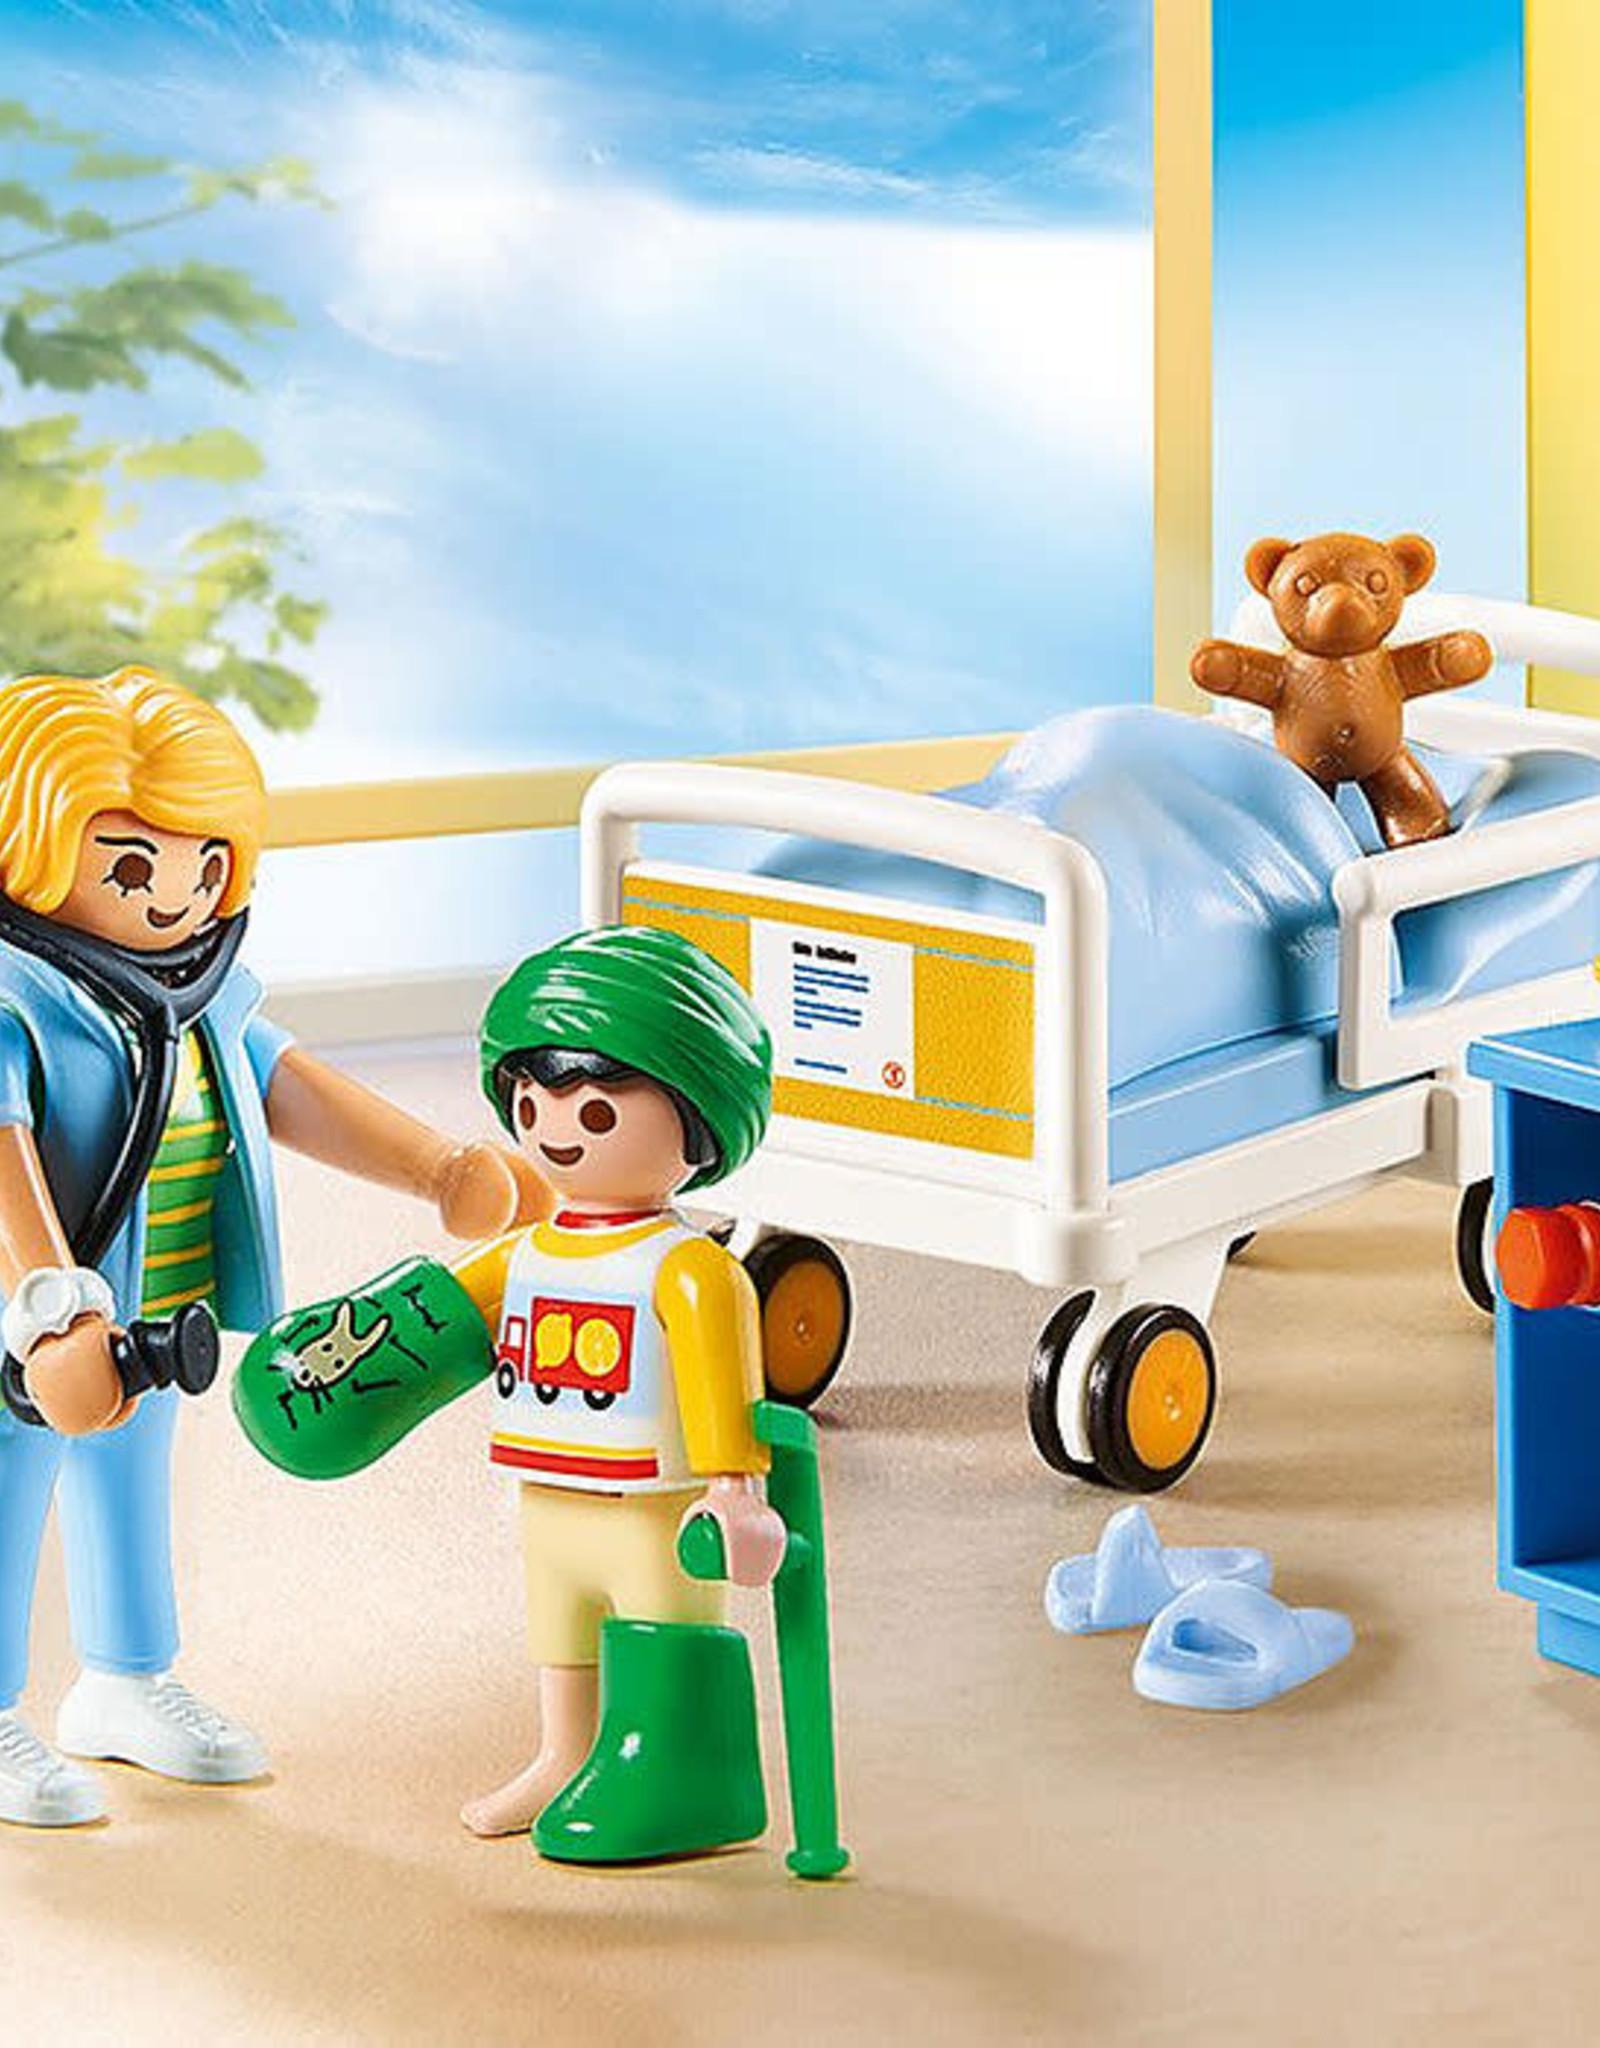 Playmobil PM Children's Hospital Room